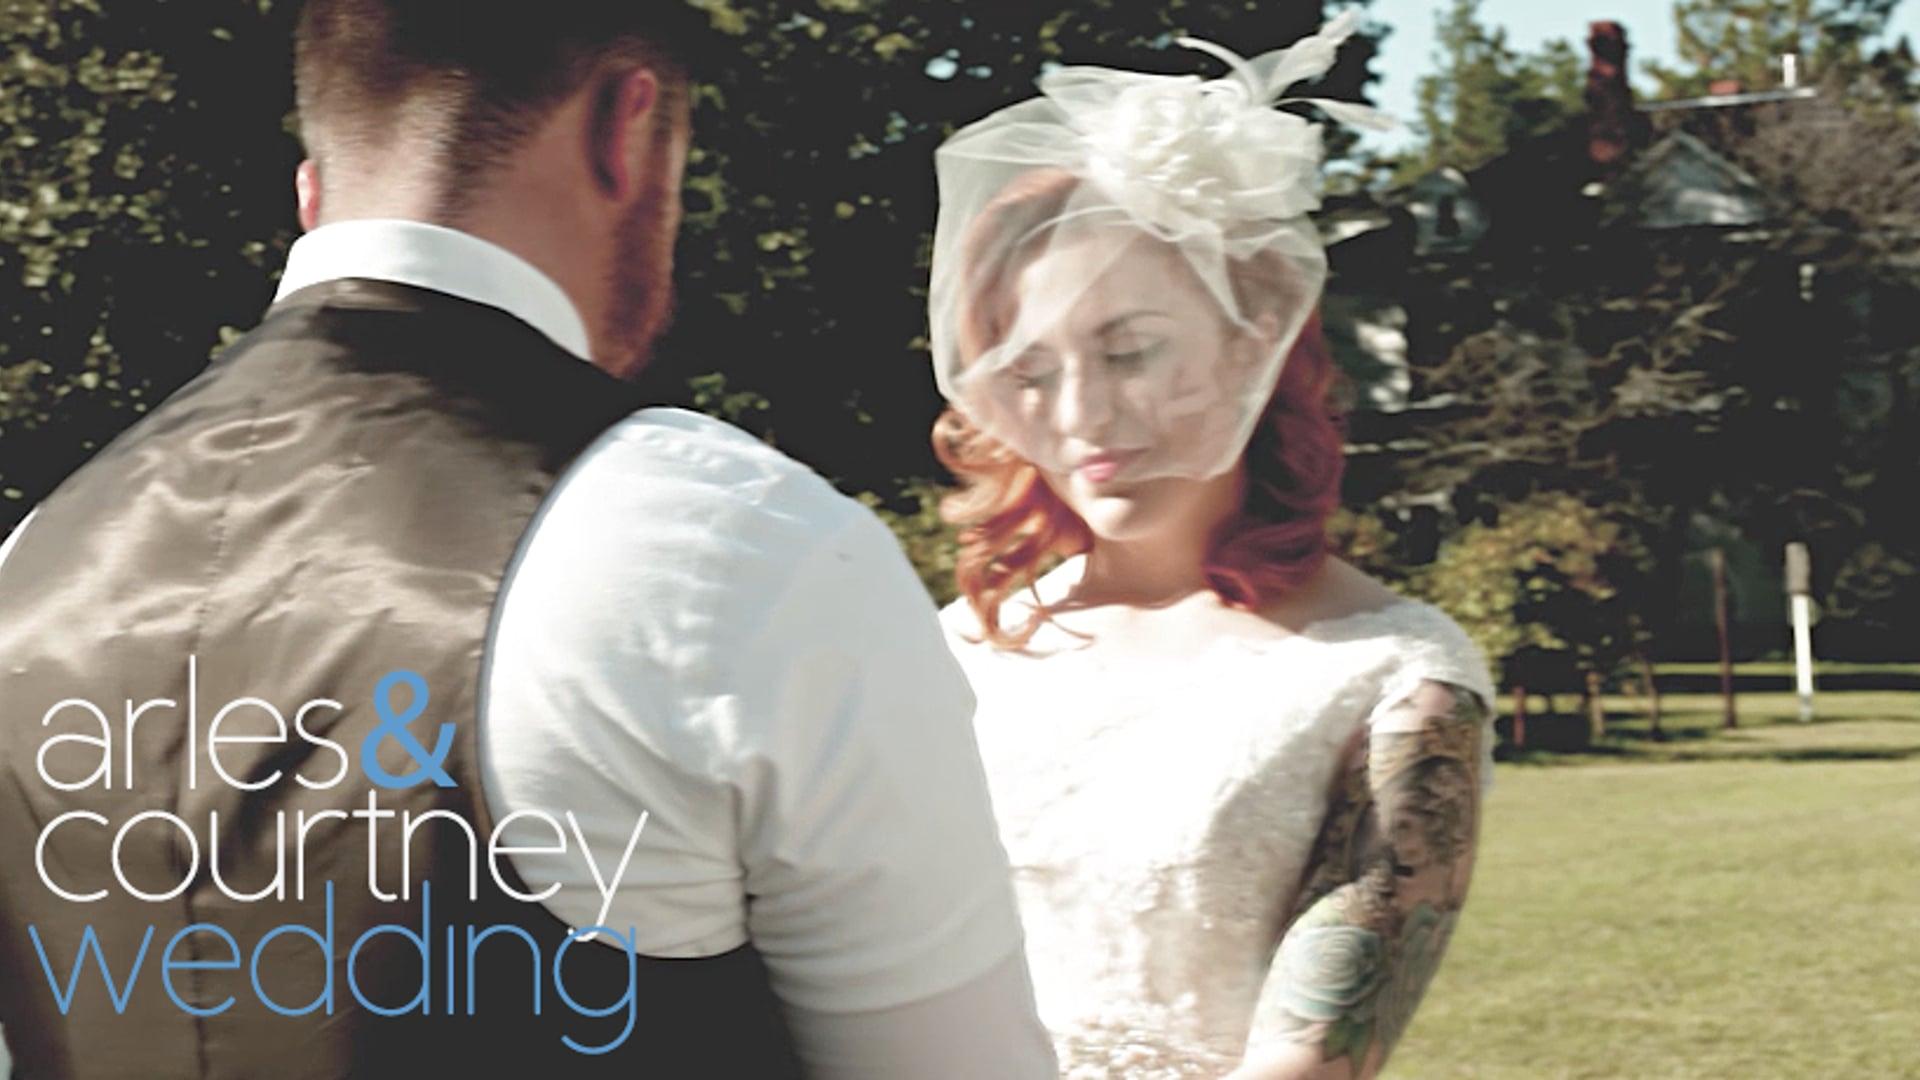 Arles & Courtney Wedding